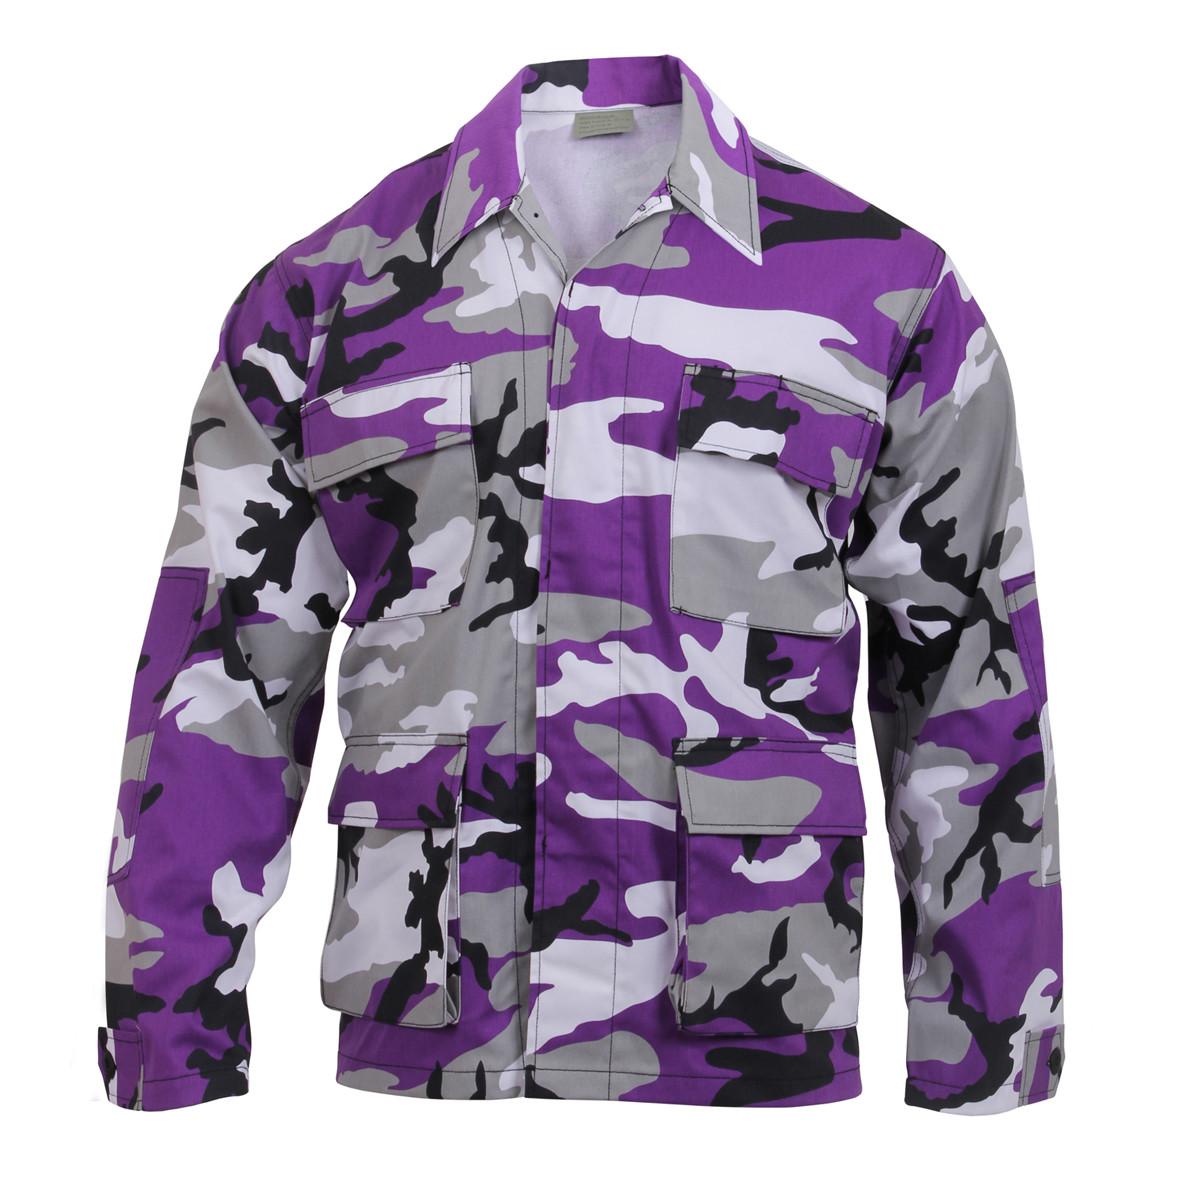 fc4d54d96a625c Shop Purple Camo BDU Shirts - Fatigues Army Navy Gear